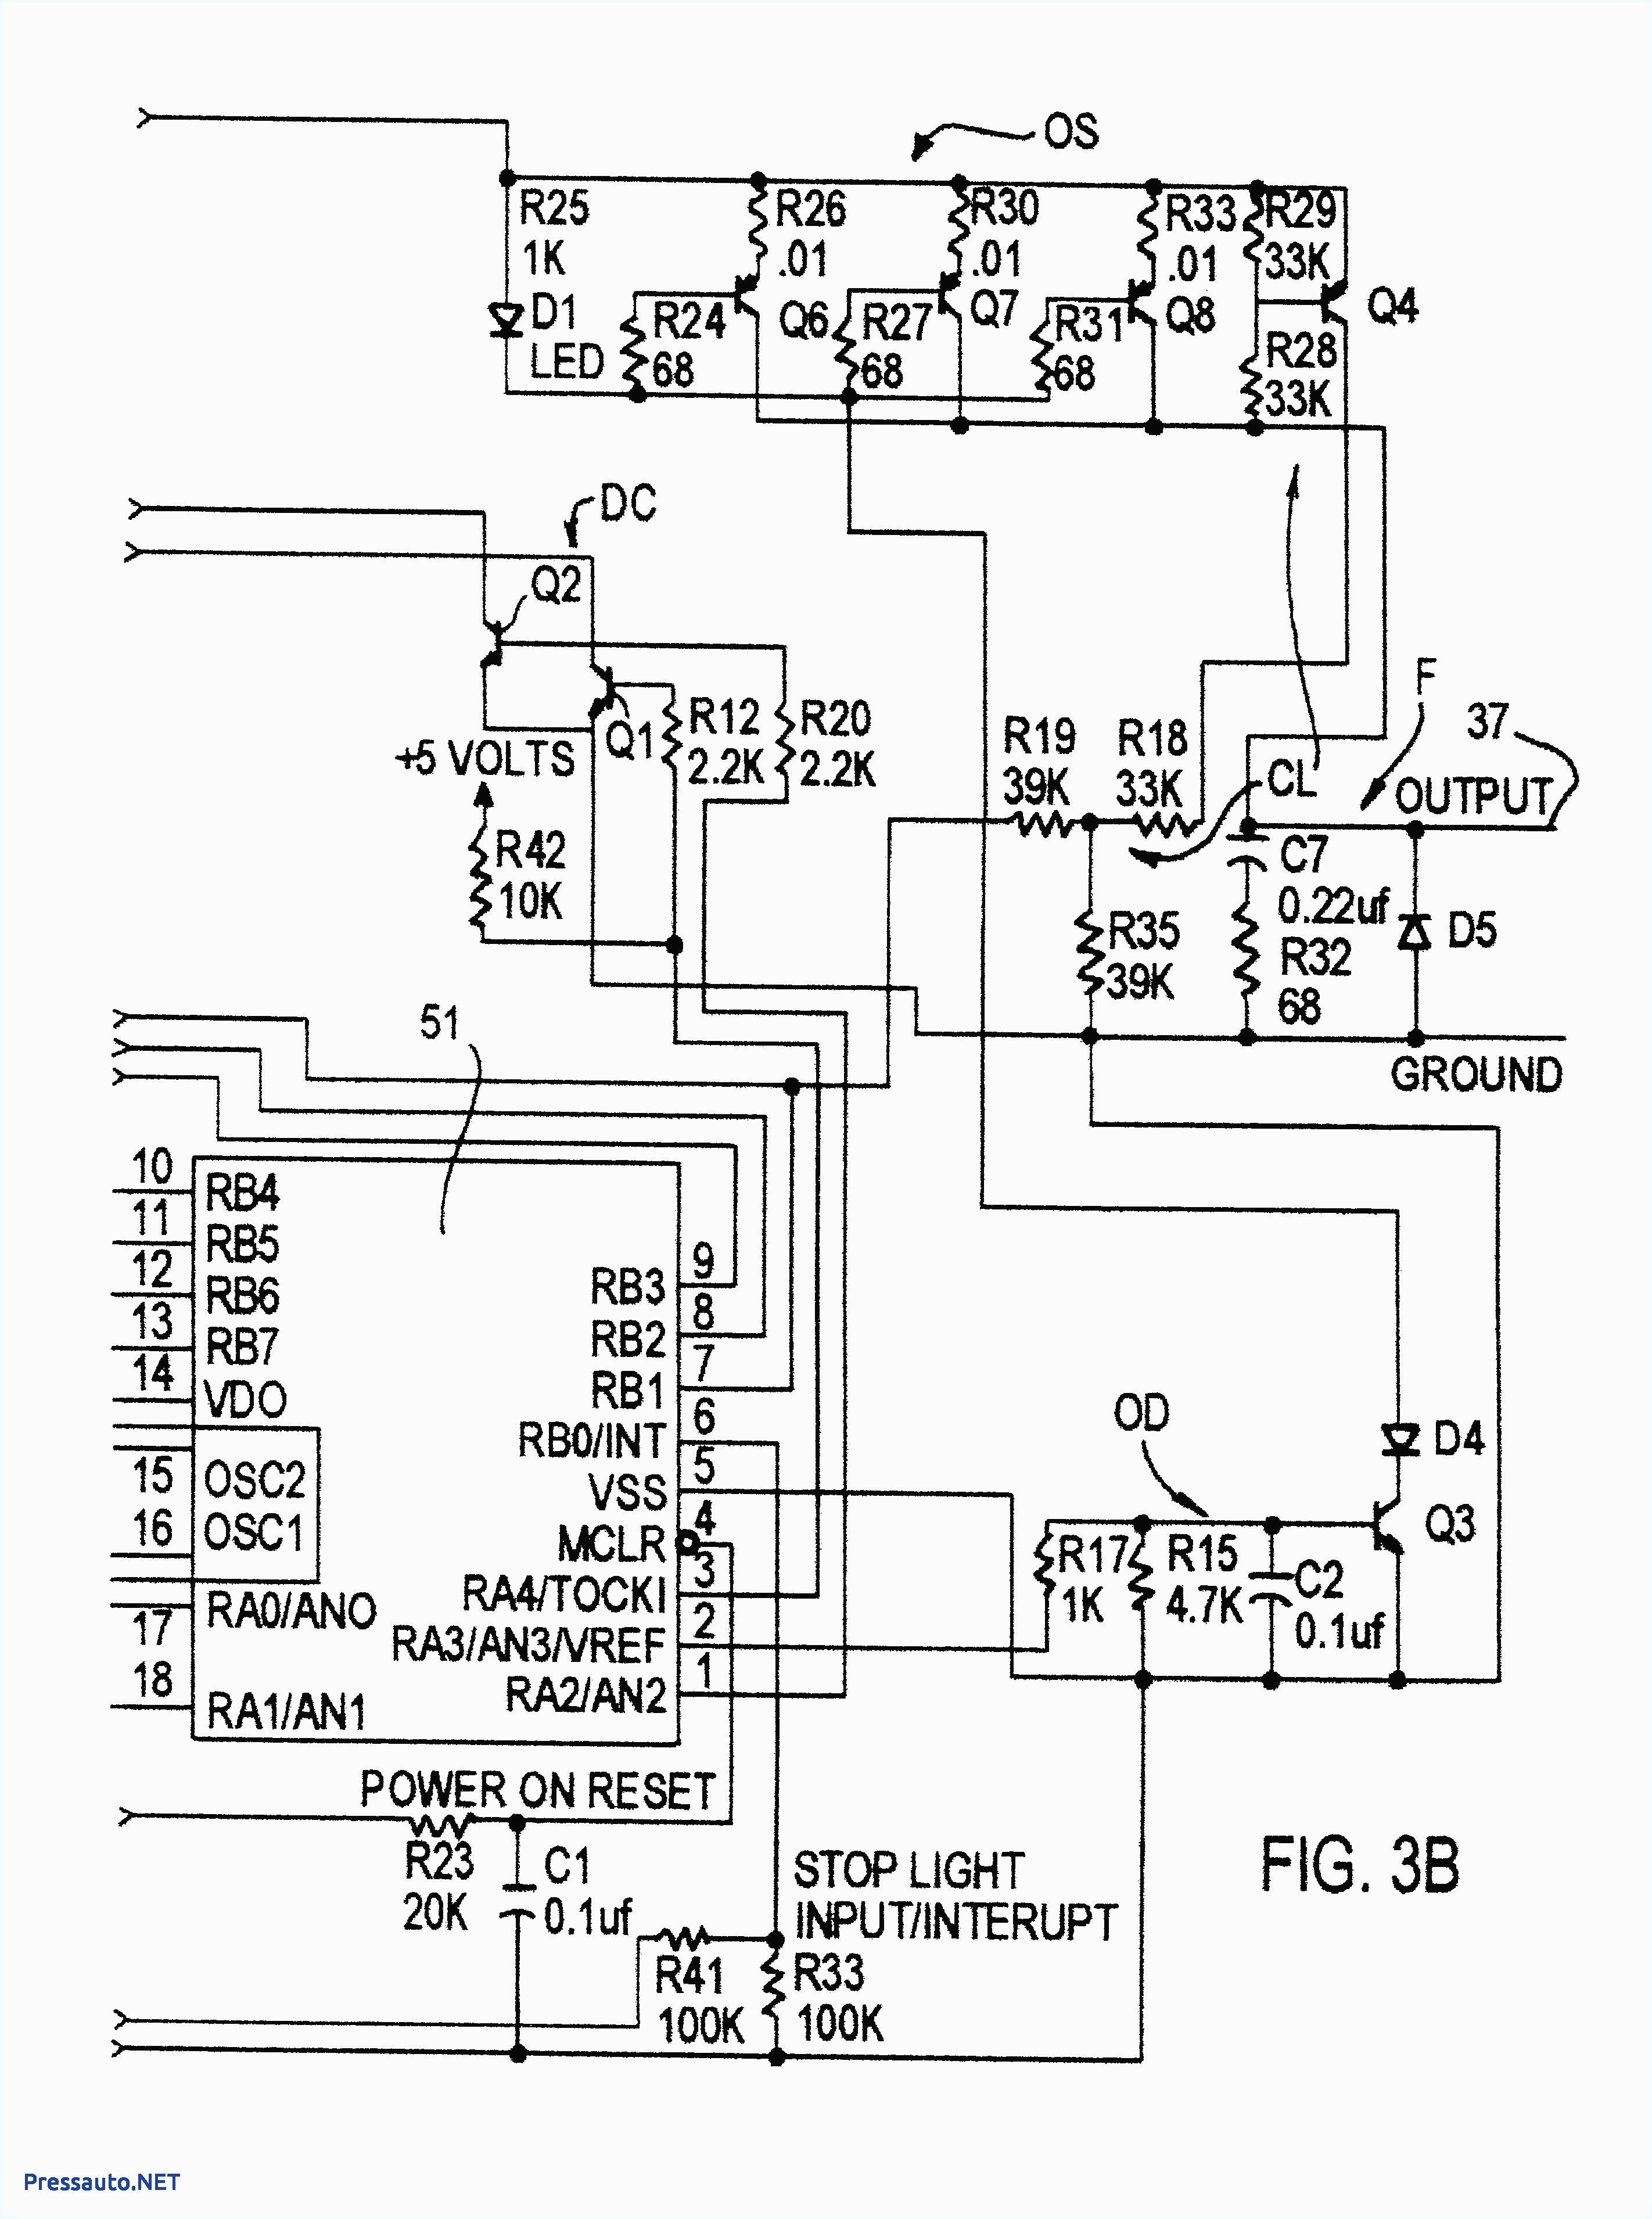 abb wiring diagrams free download diagram schematic wiring diagram abb ats021 wiring diagram abb vfd control